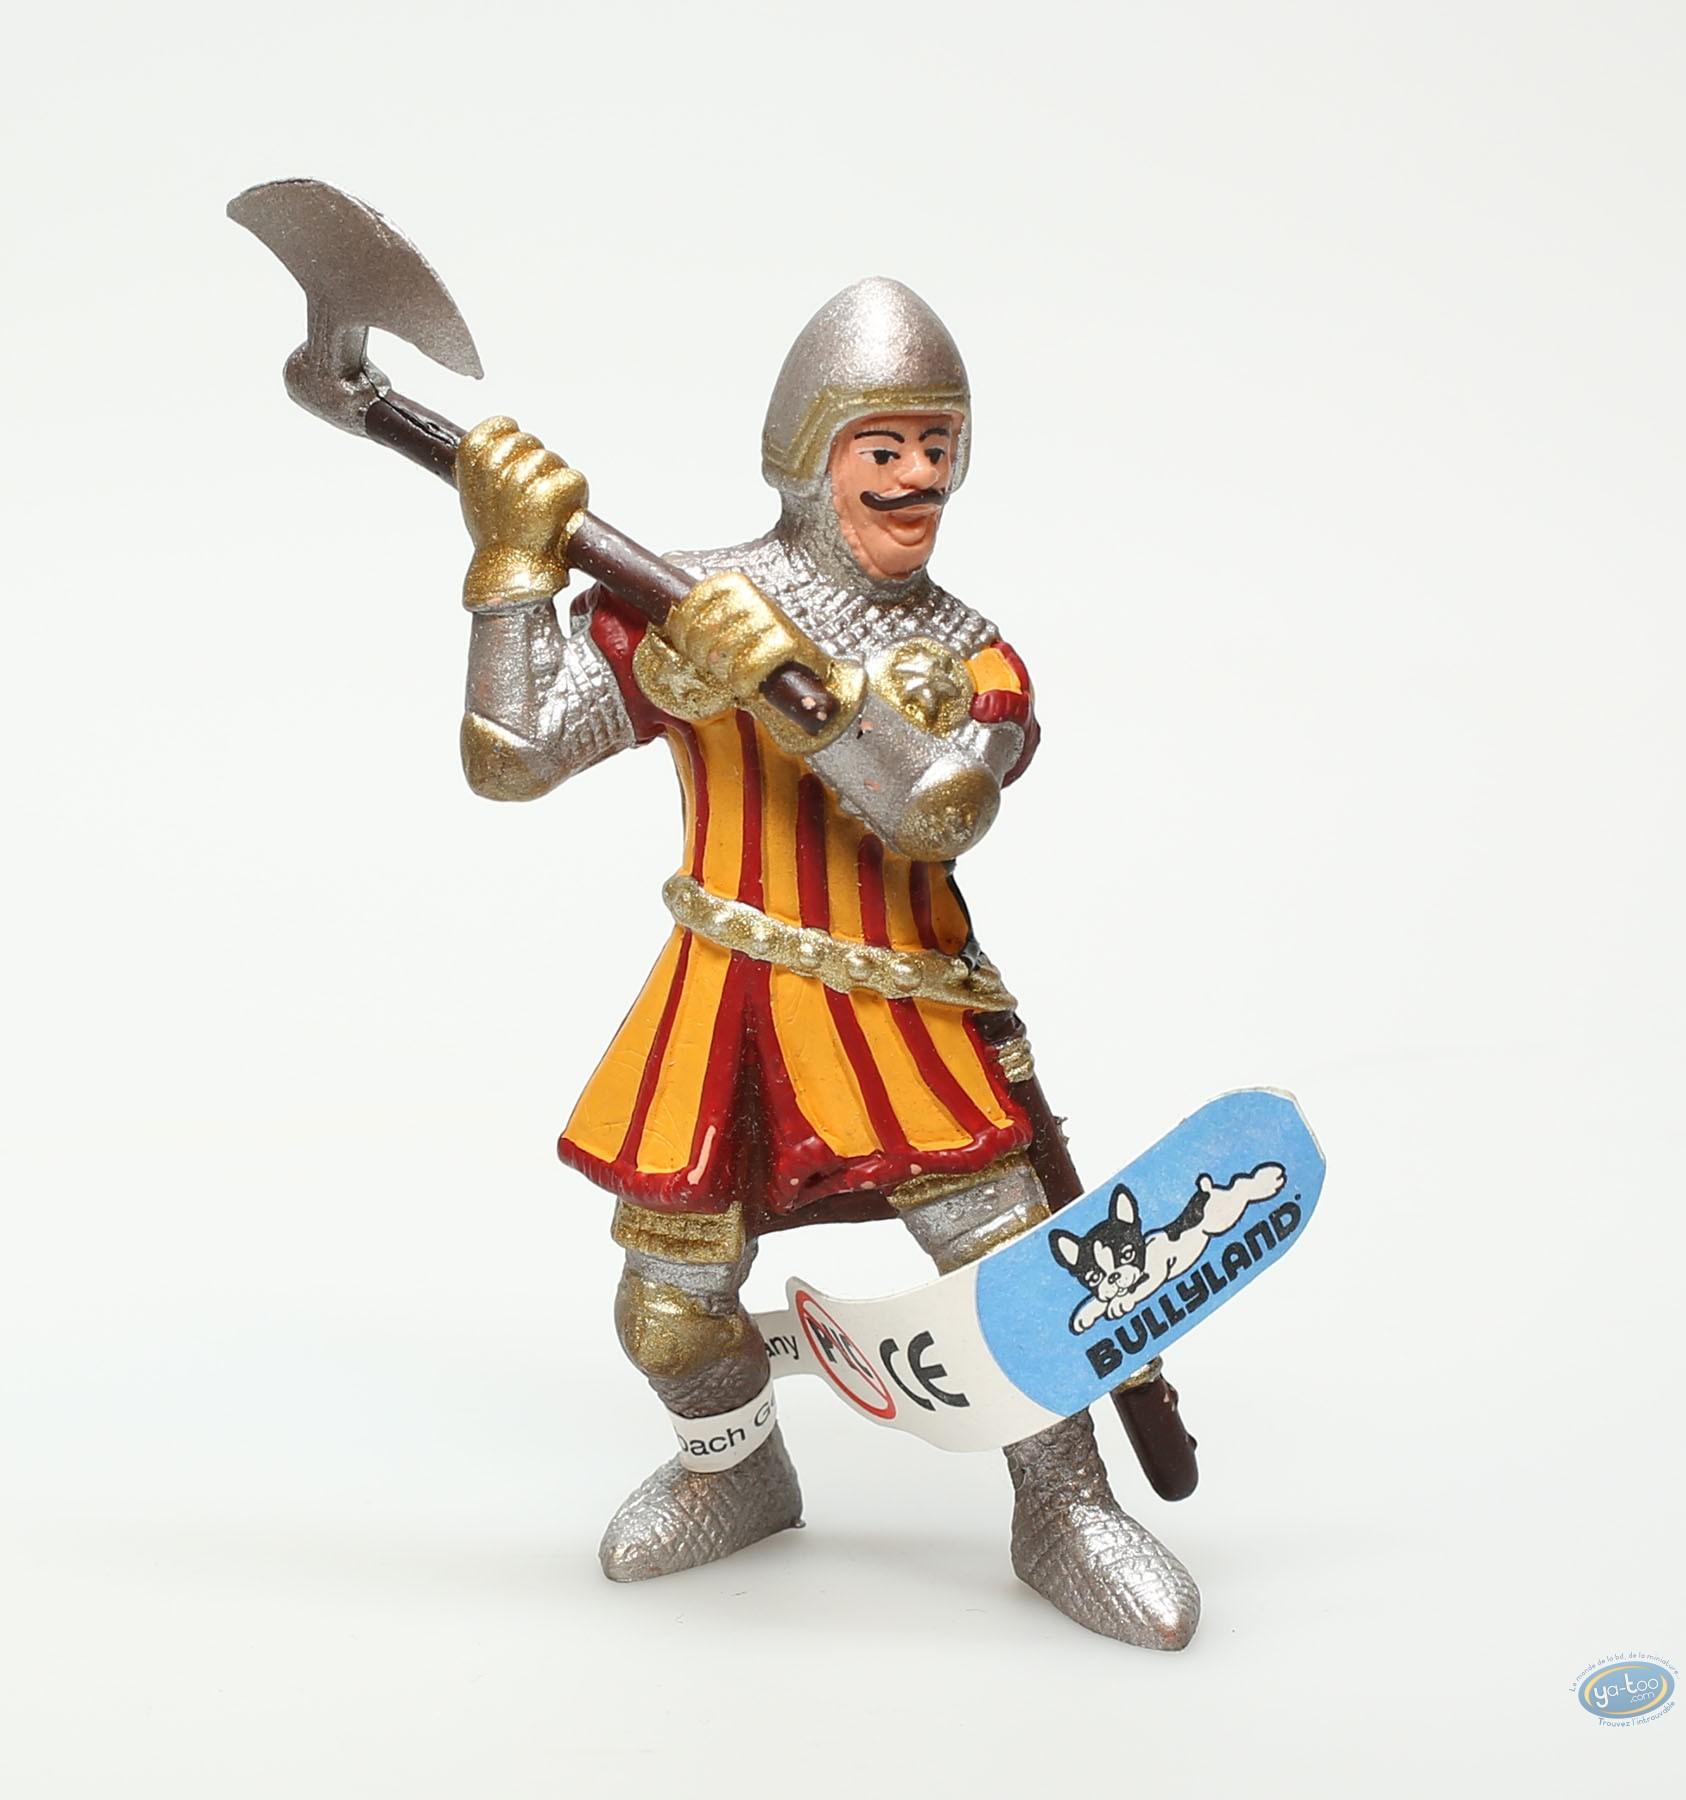 Plastic Figurine, Plastic figure, Knight : Knight with axe